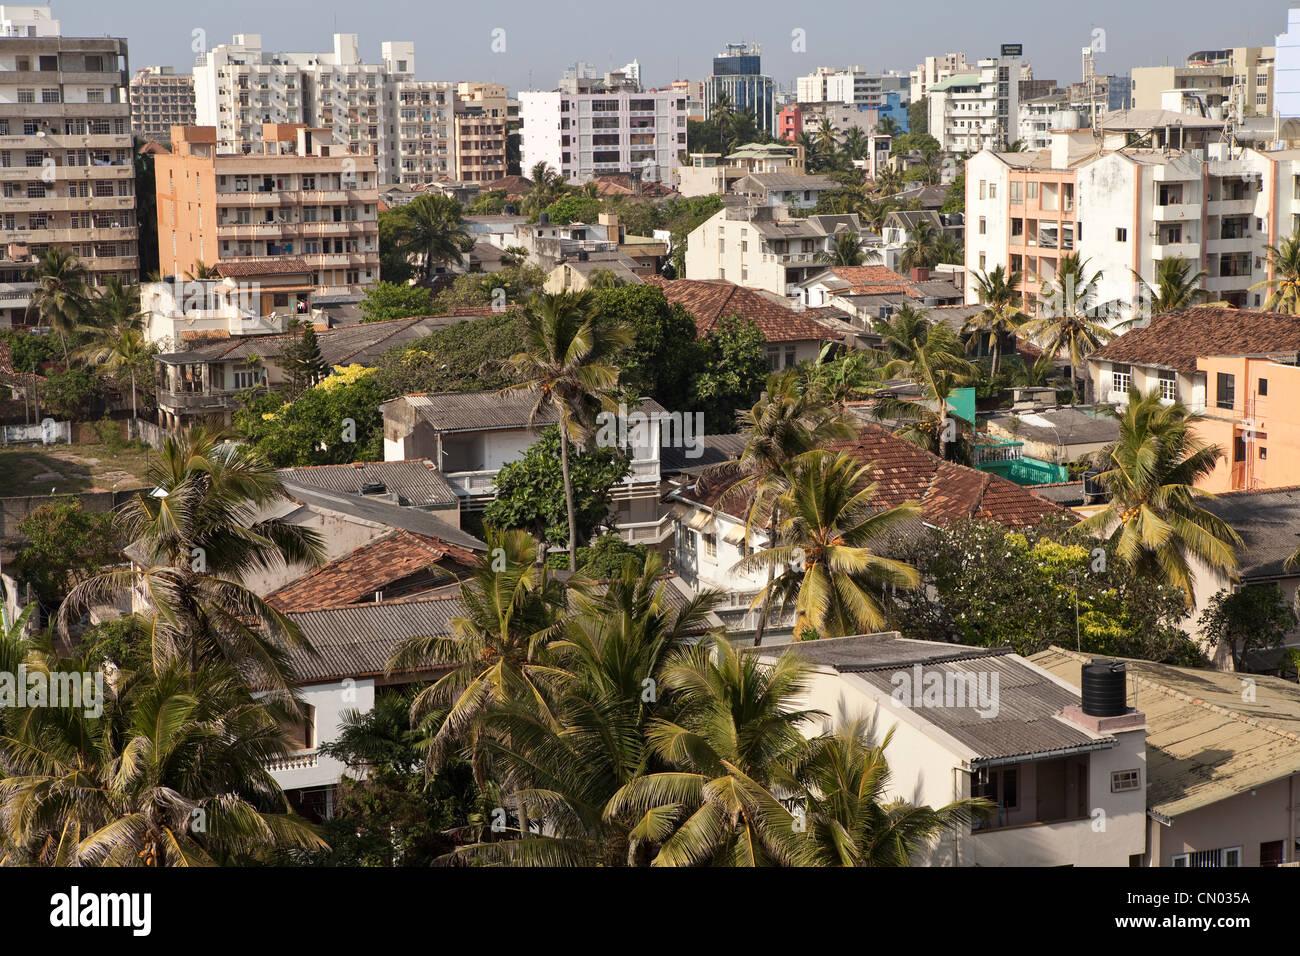 Colombo, Sri Lanka Skyline. - Stock Image